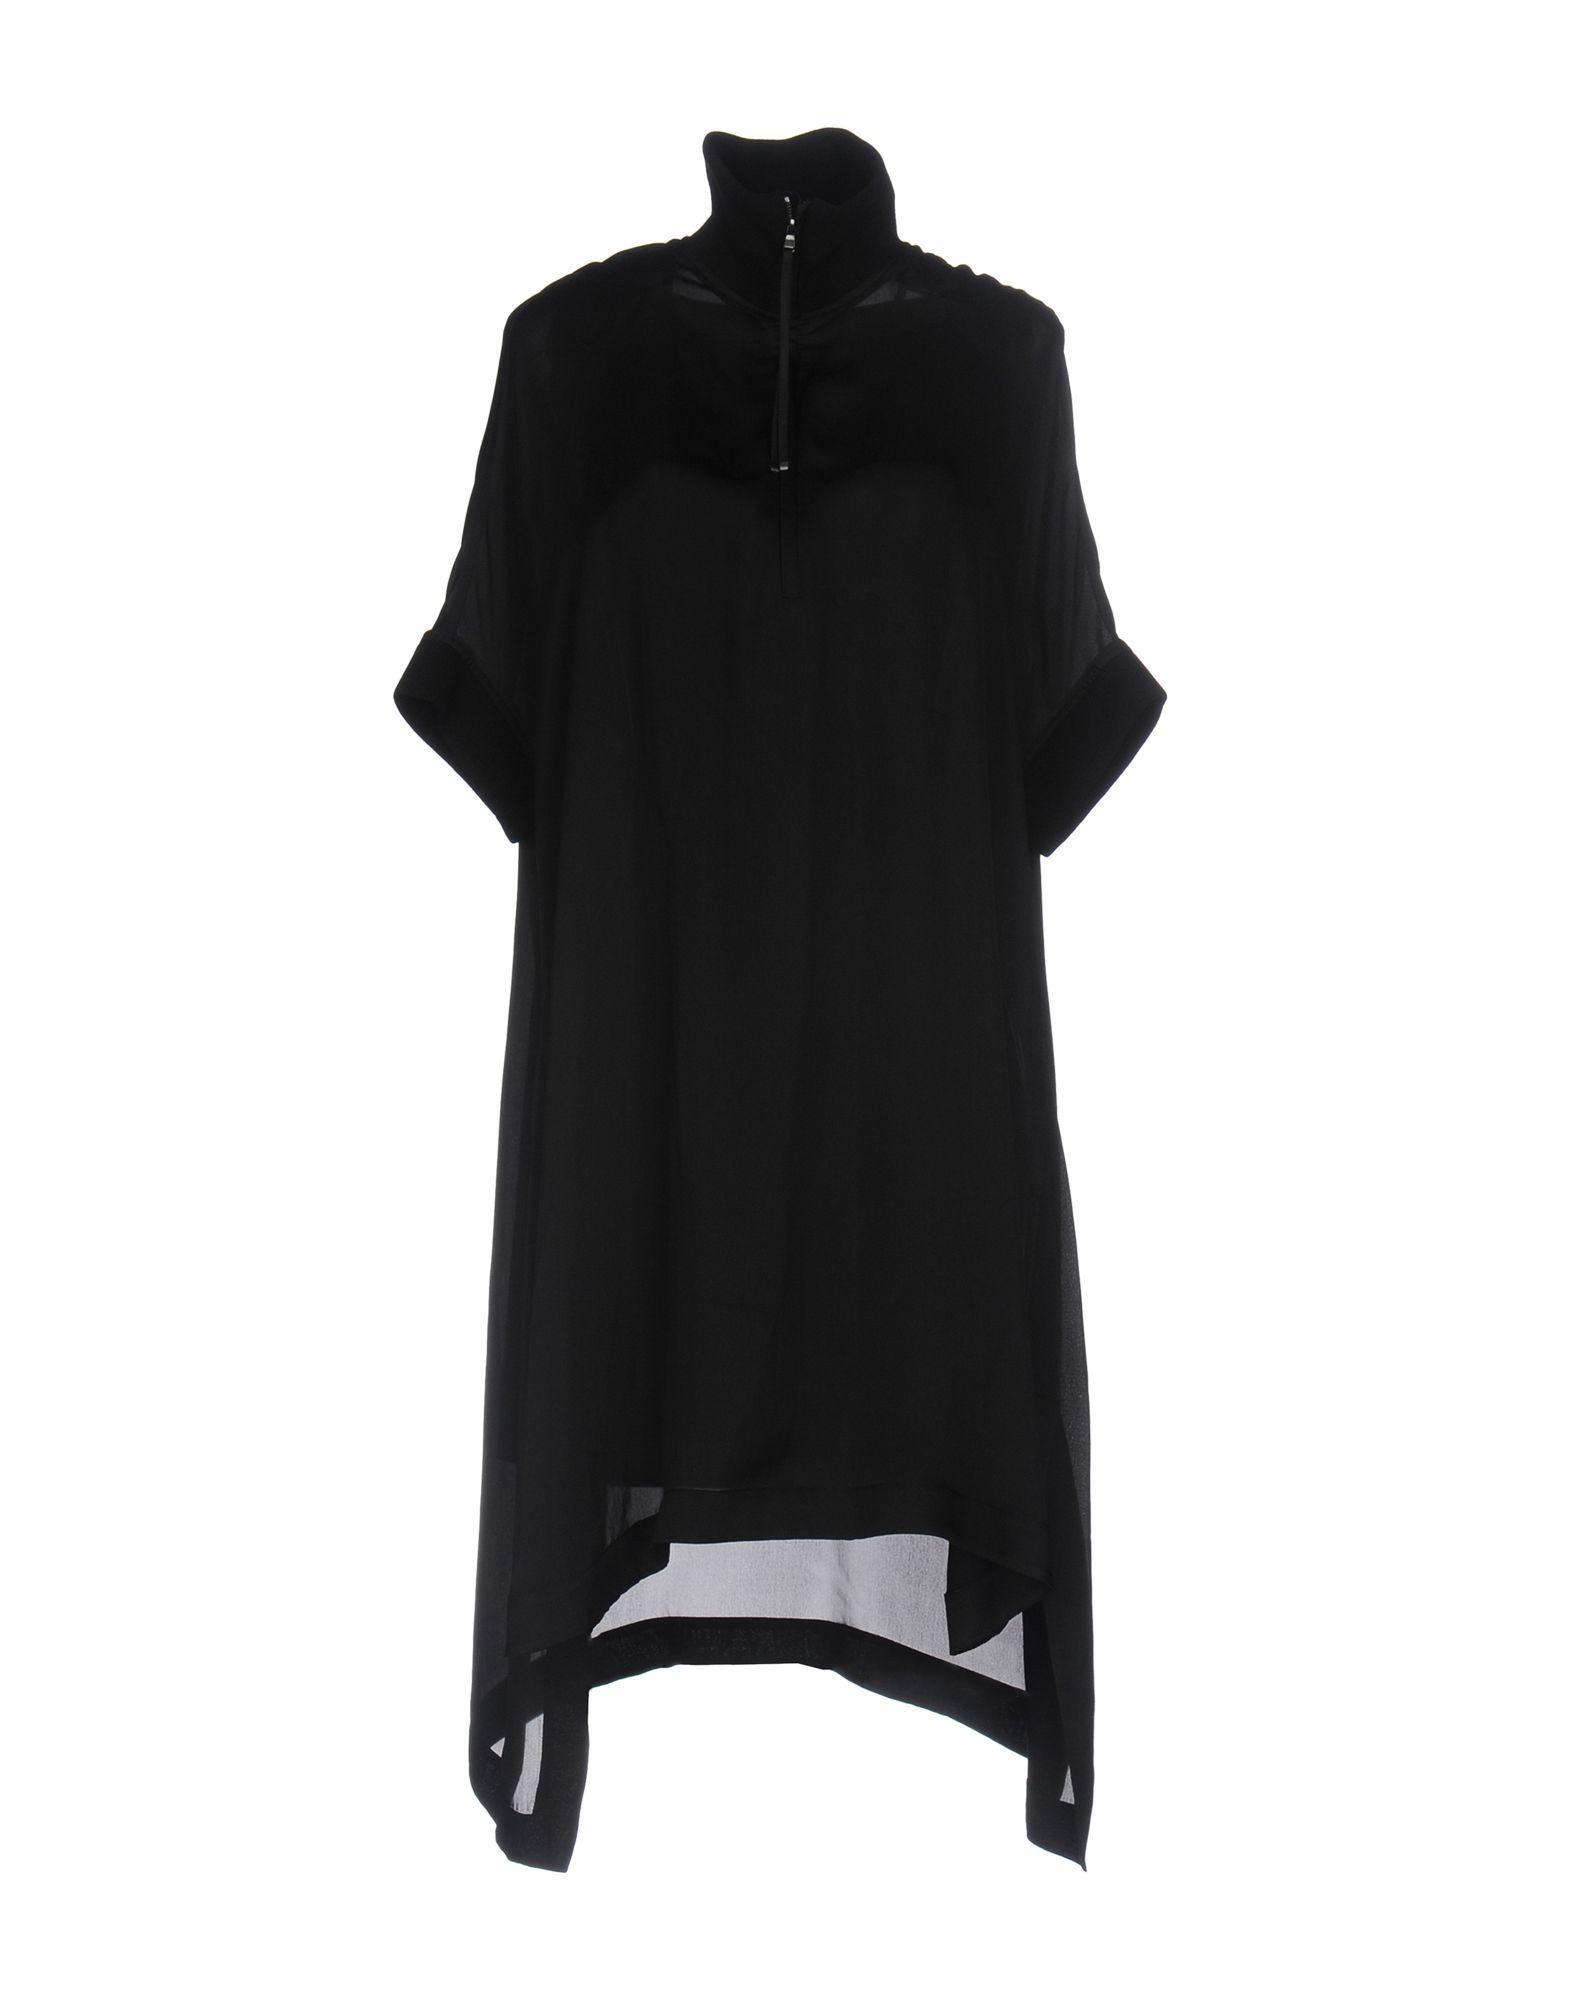 цены на DIESEL BLACK GOLD Короткое платье в интернет-магазинах